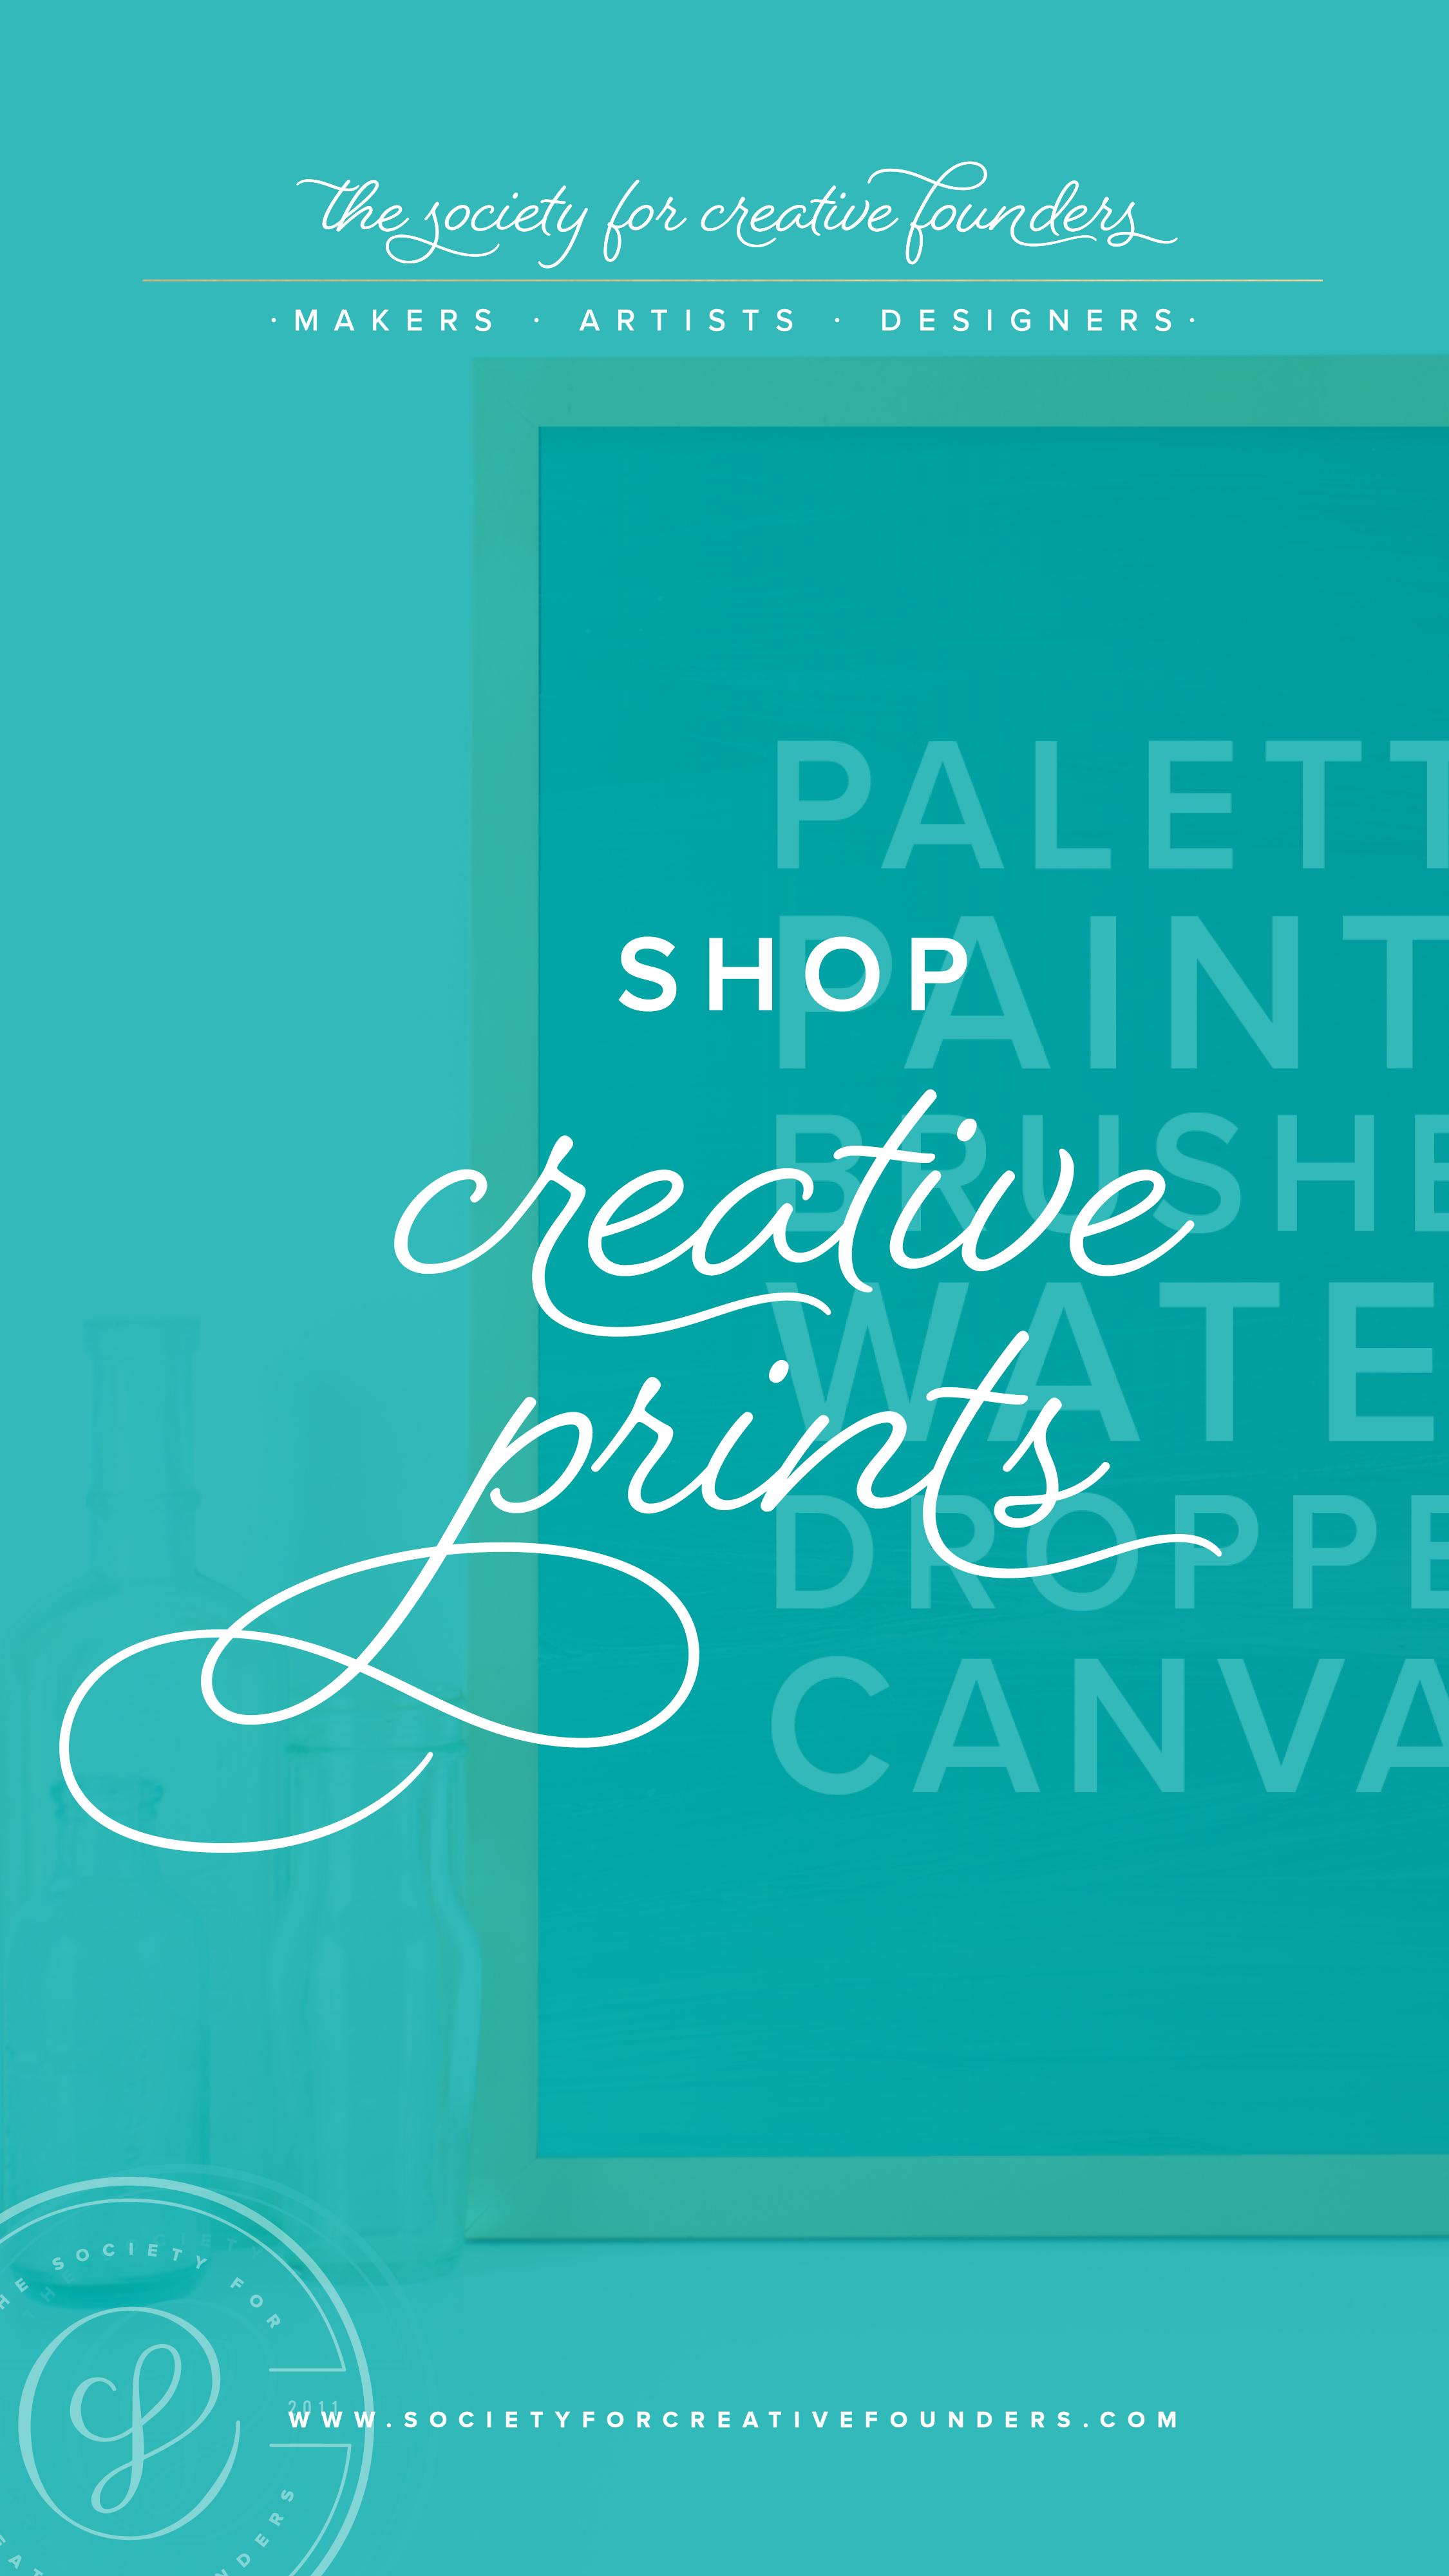 Creative Founders Shop - Prints